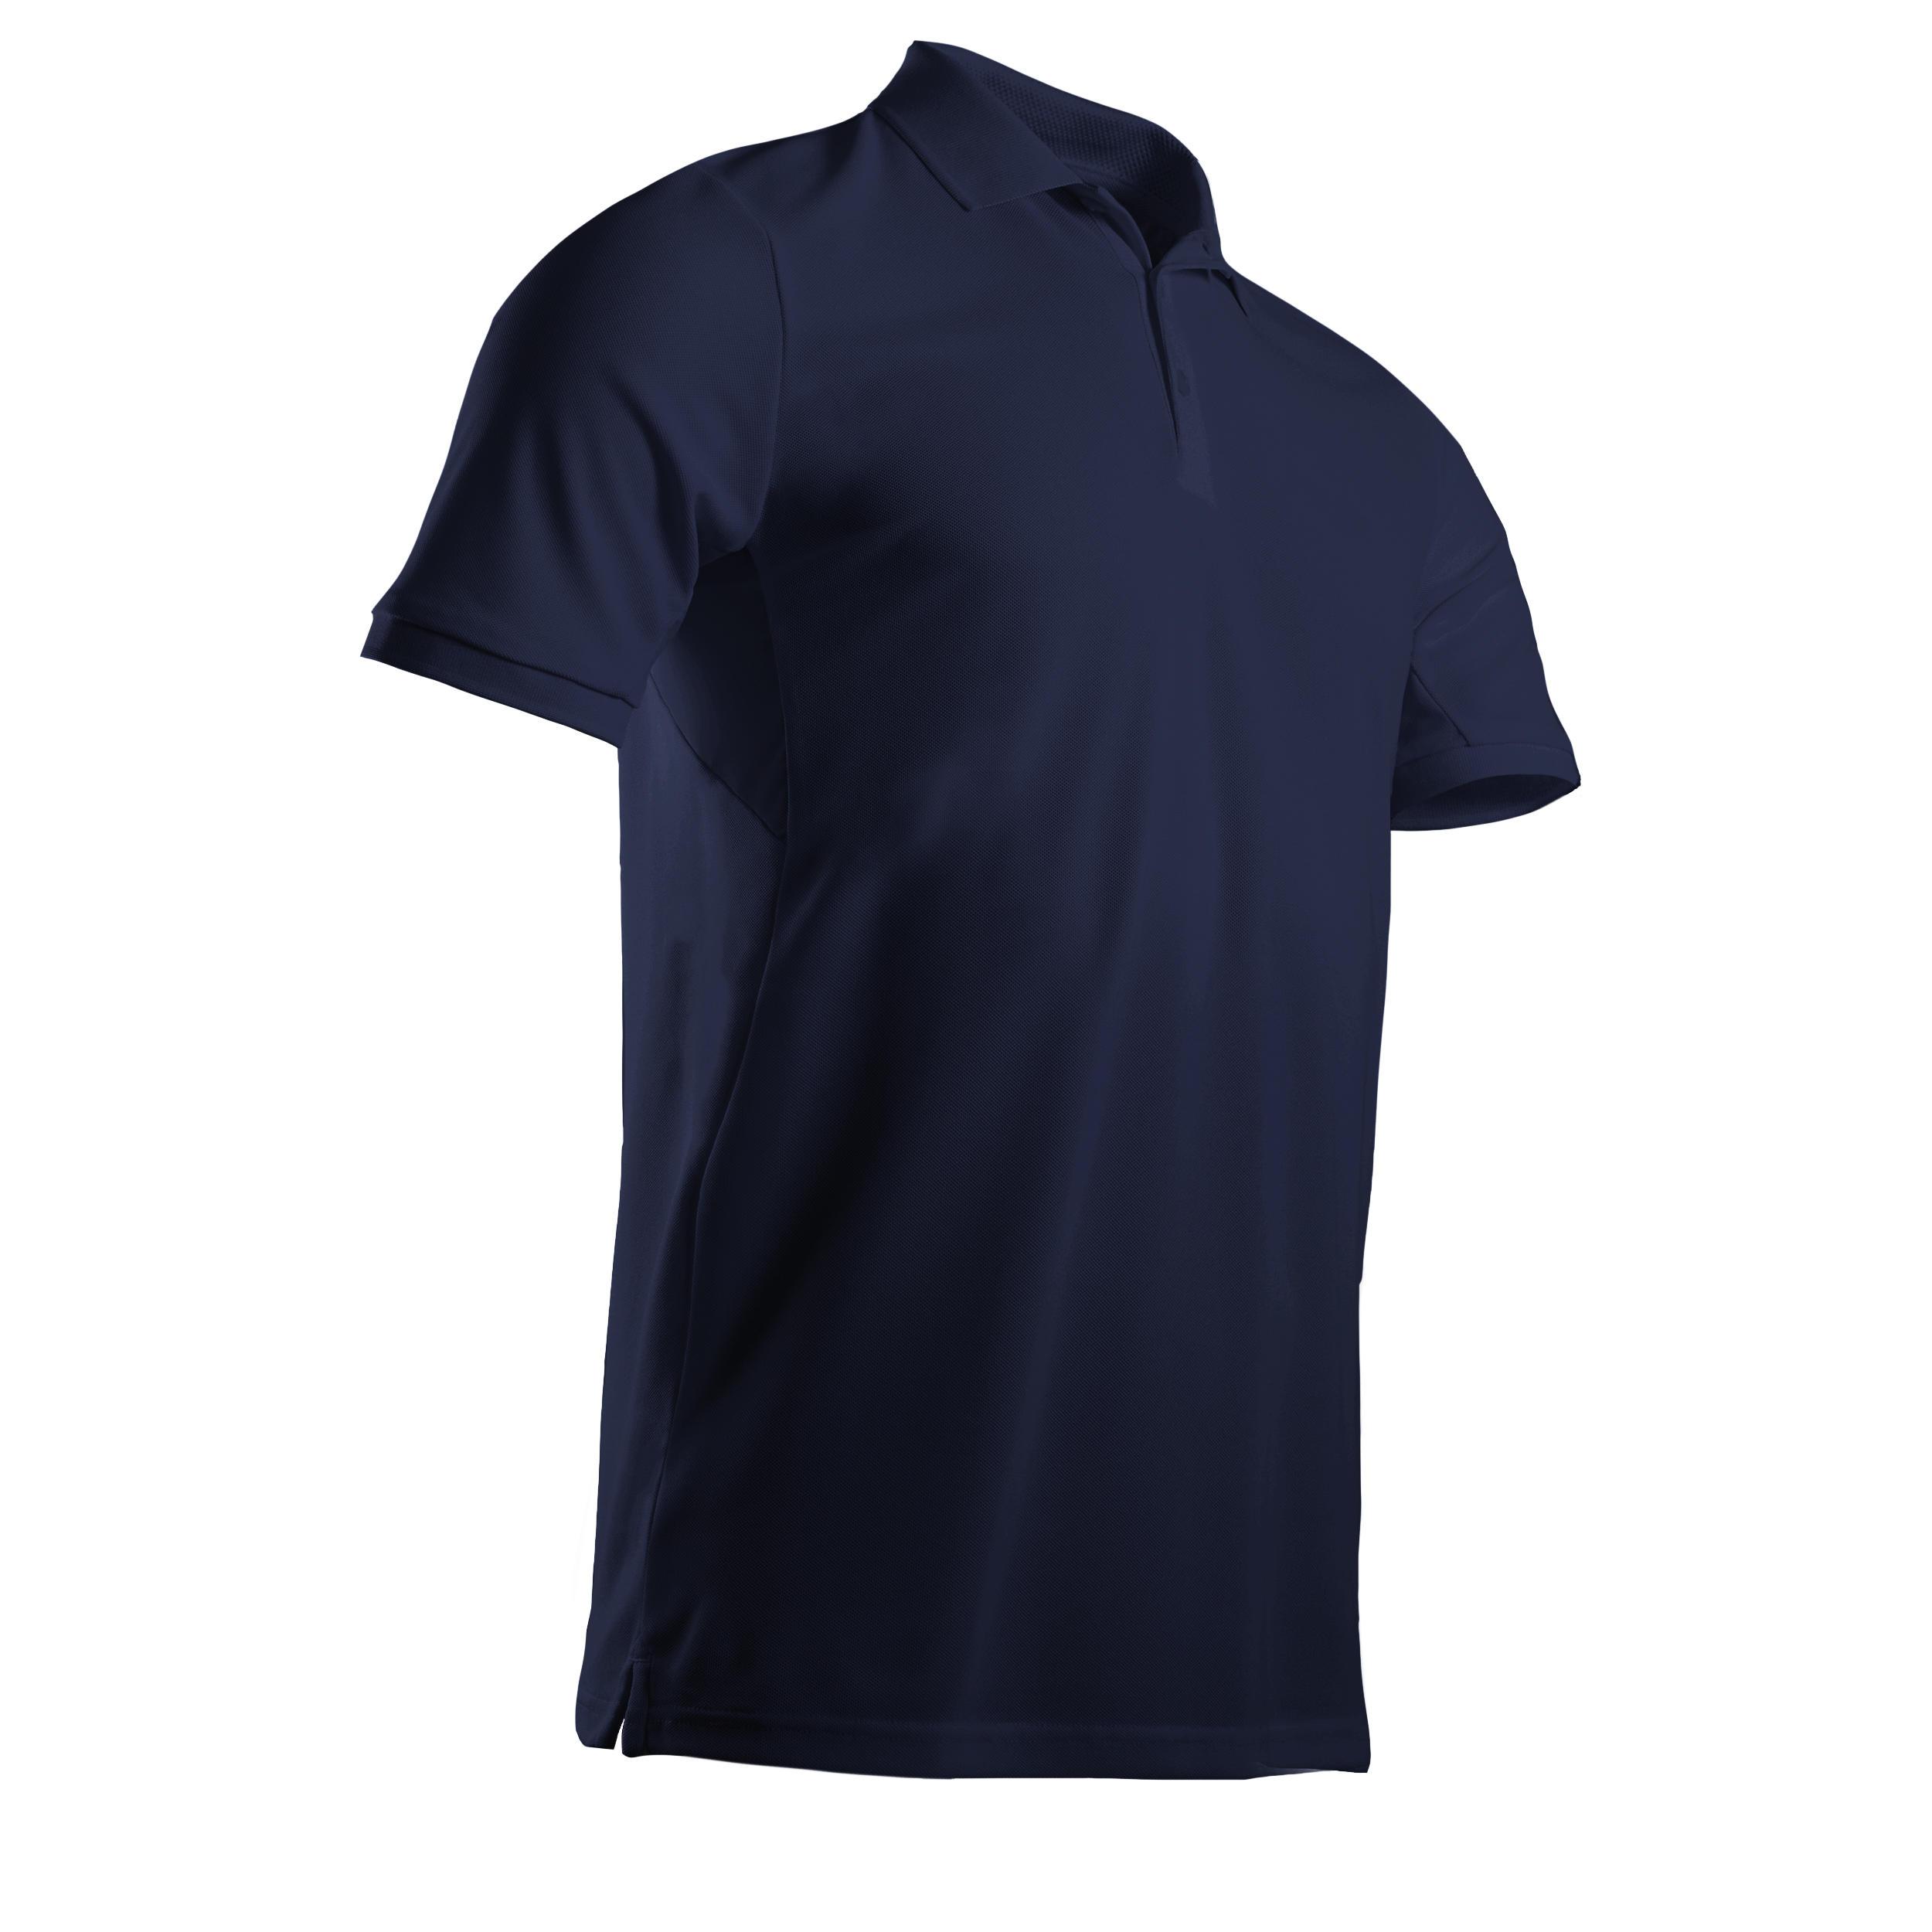 Tricou Polo Light Golf Bărbați la Reducere poza